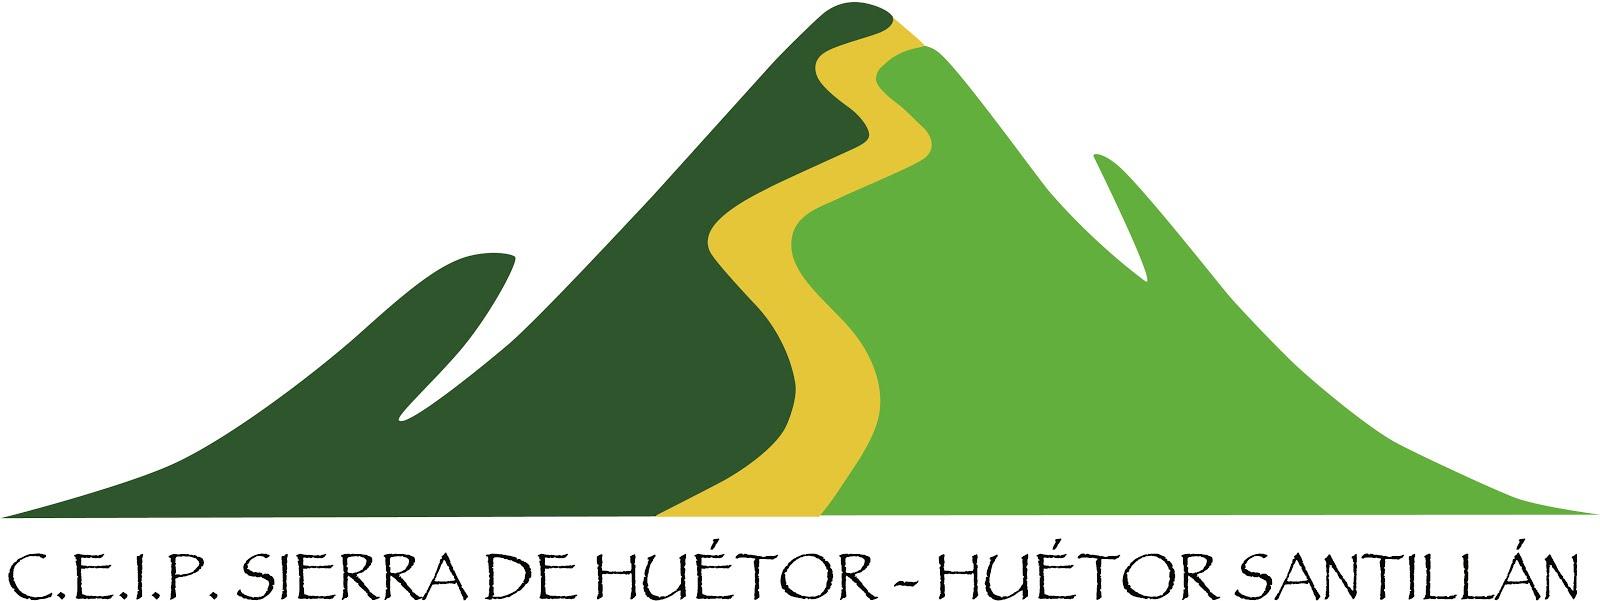 C.E.I.P. Sierra de Huétor      (Huétor Santillán)